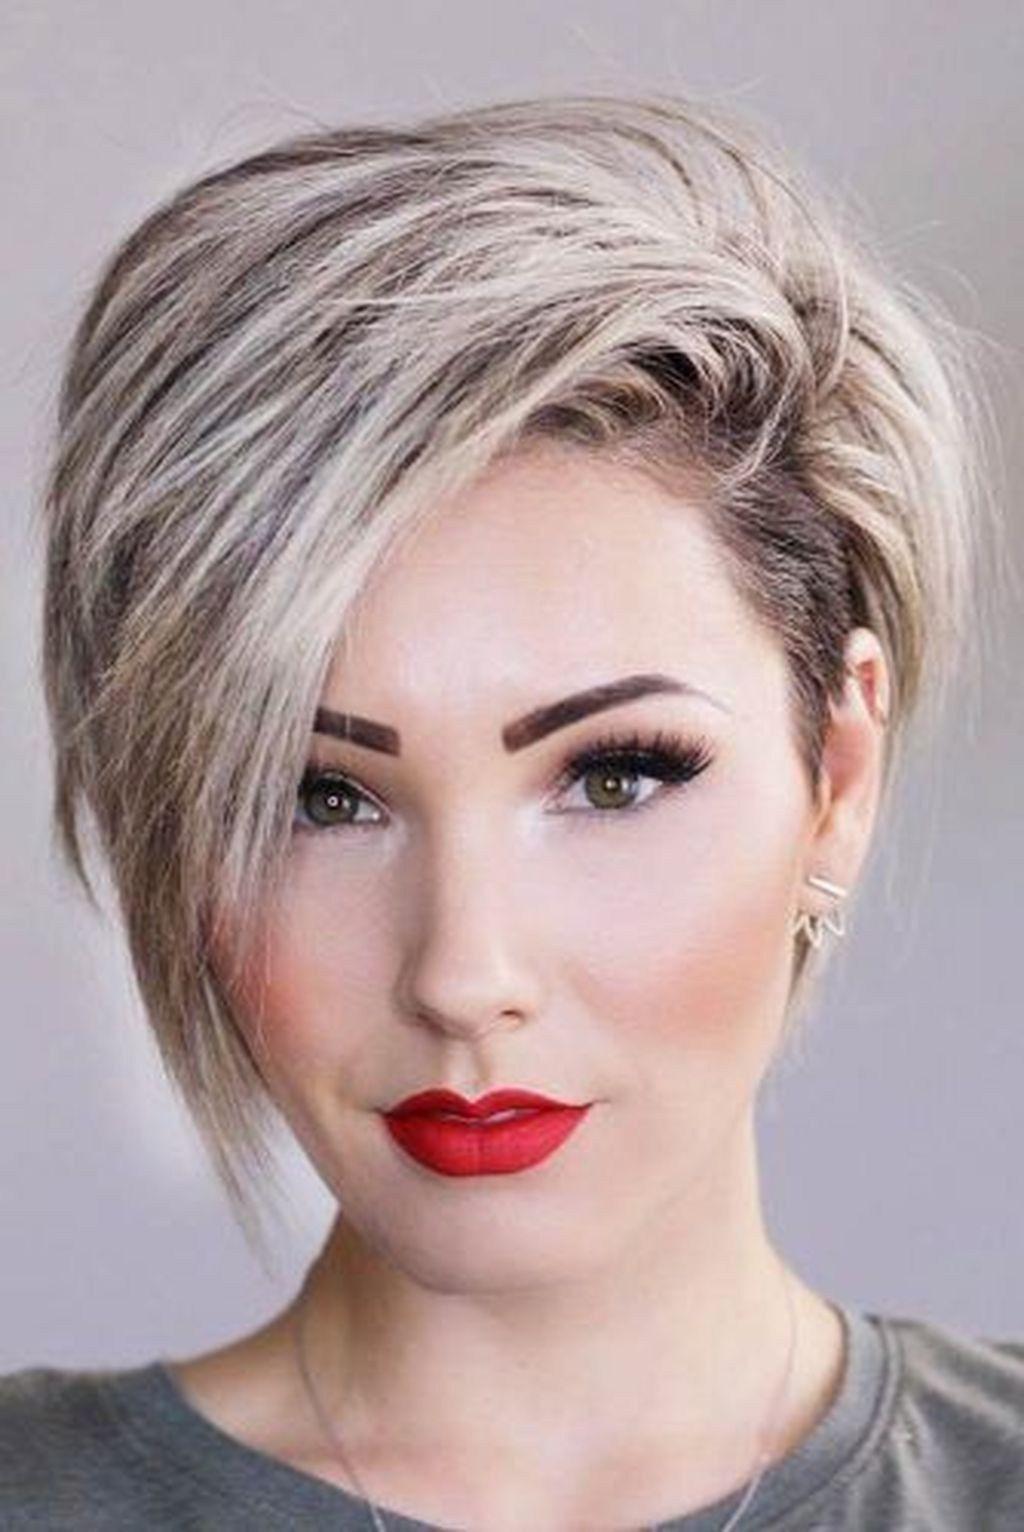 18 Beautiful Short Pixie Hairstyles: Short Hair Trends 2015